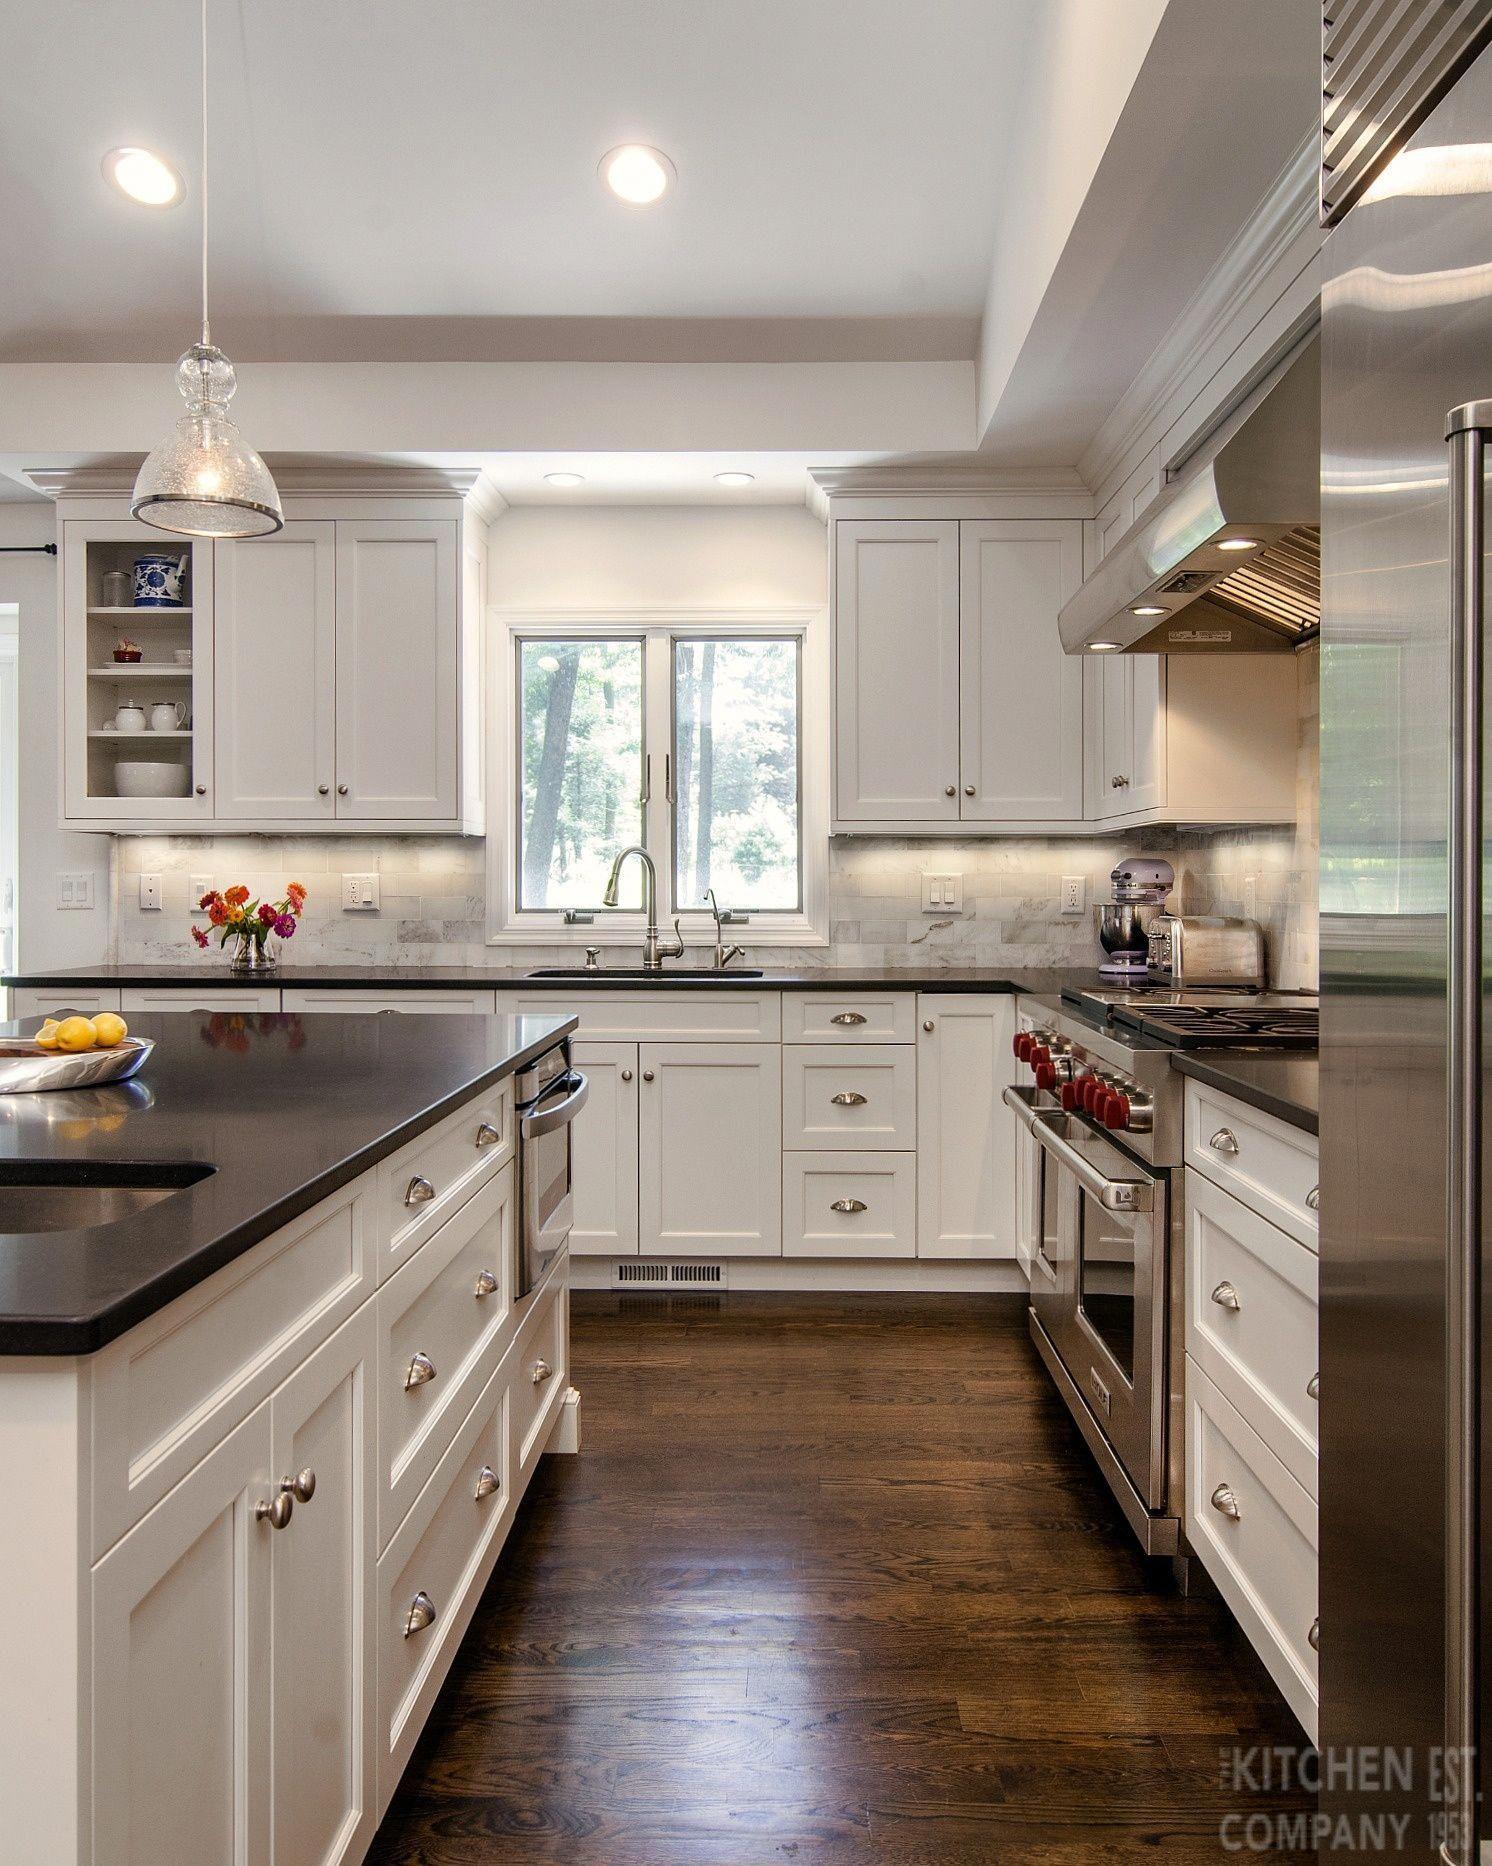 Gorgeous Photo Coastalkitchens Kitchen Remodel Countertops Replacing Kitchen Countertops Black Kitchen Countertops